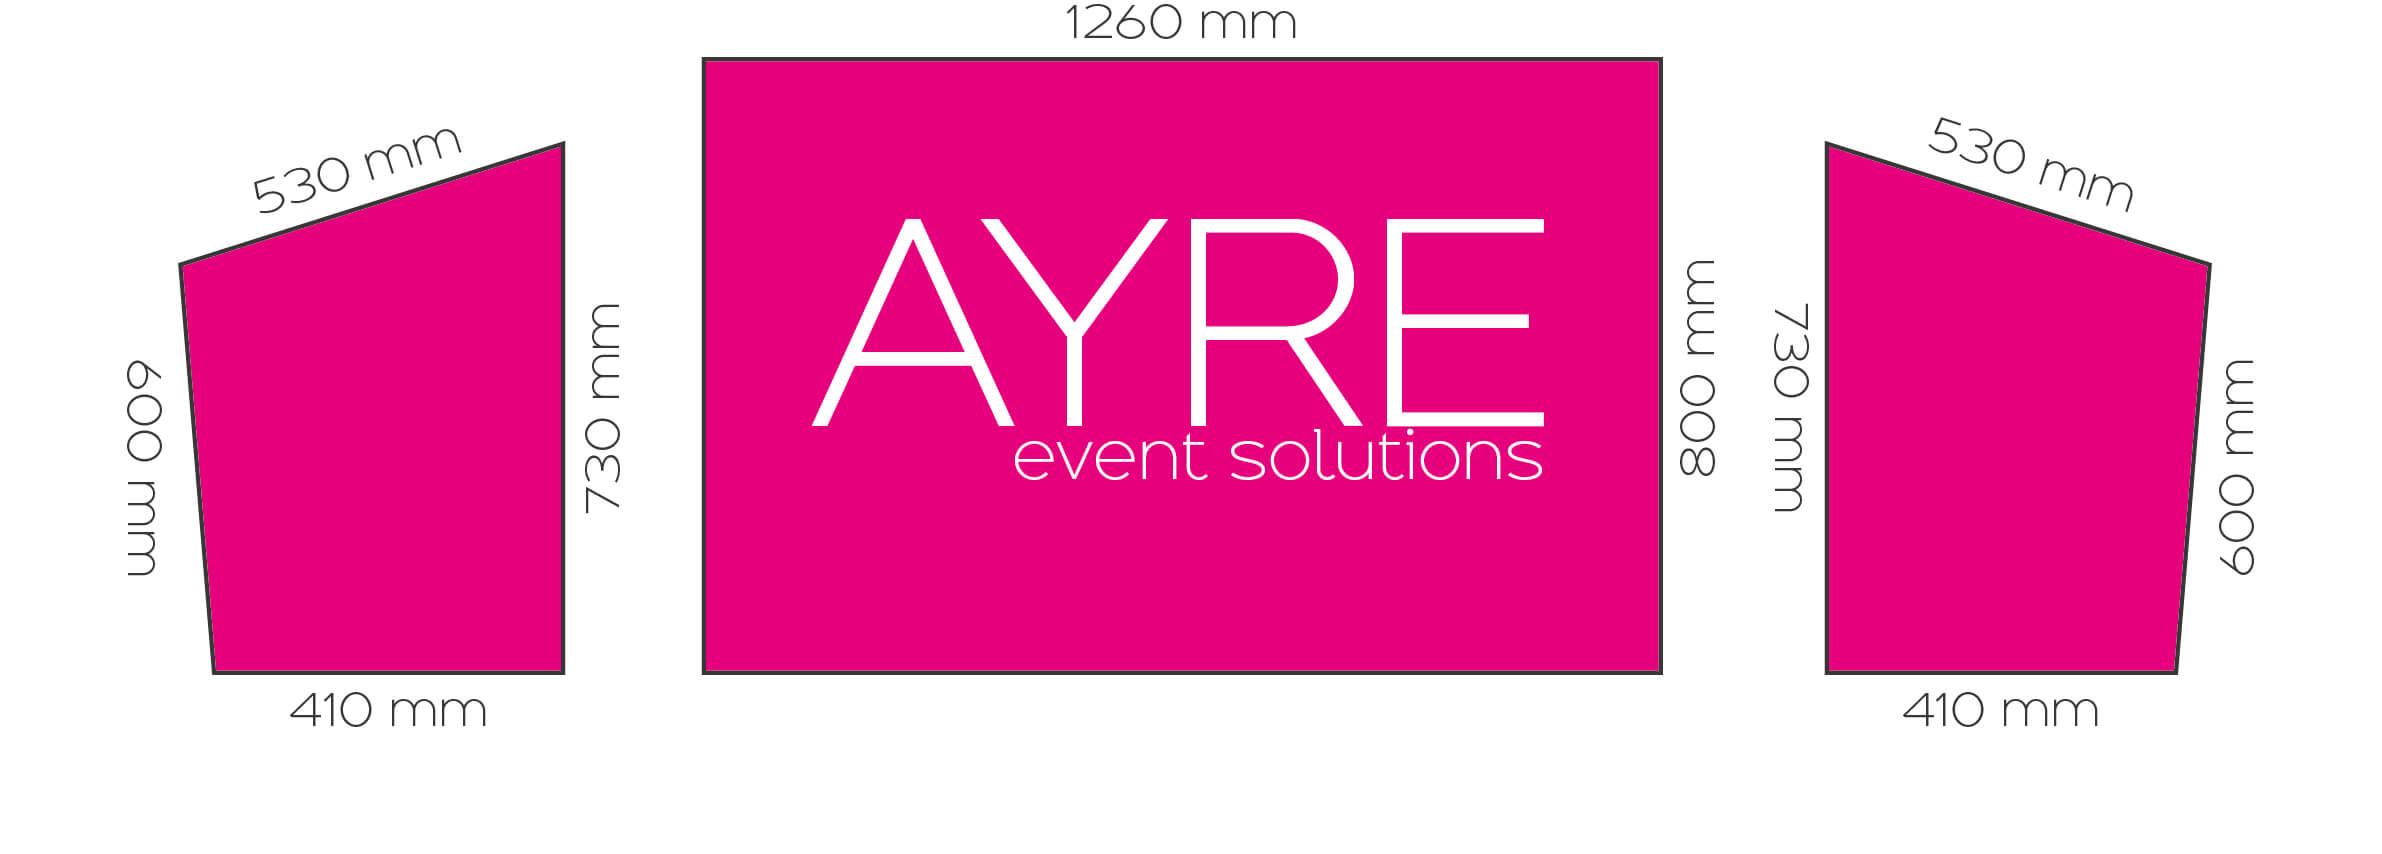 LiteConsole XPRS Hire from AYRE LTD Custom Design